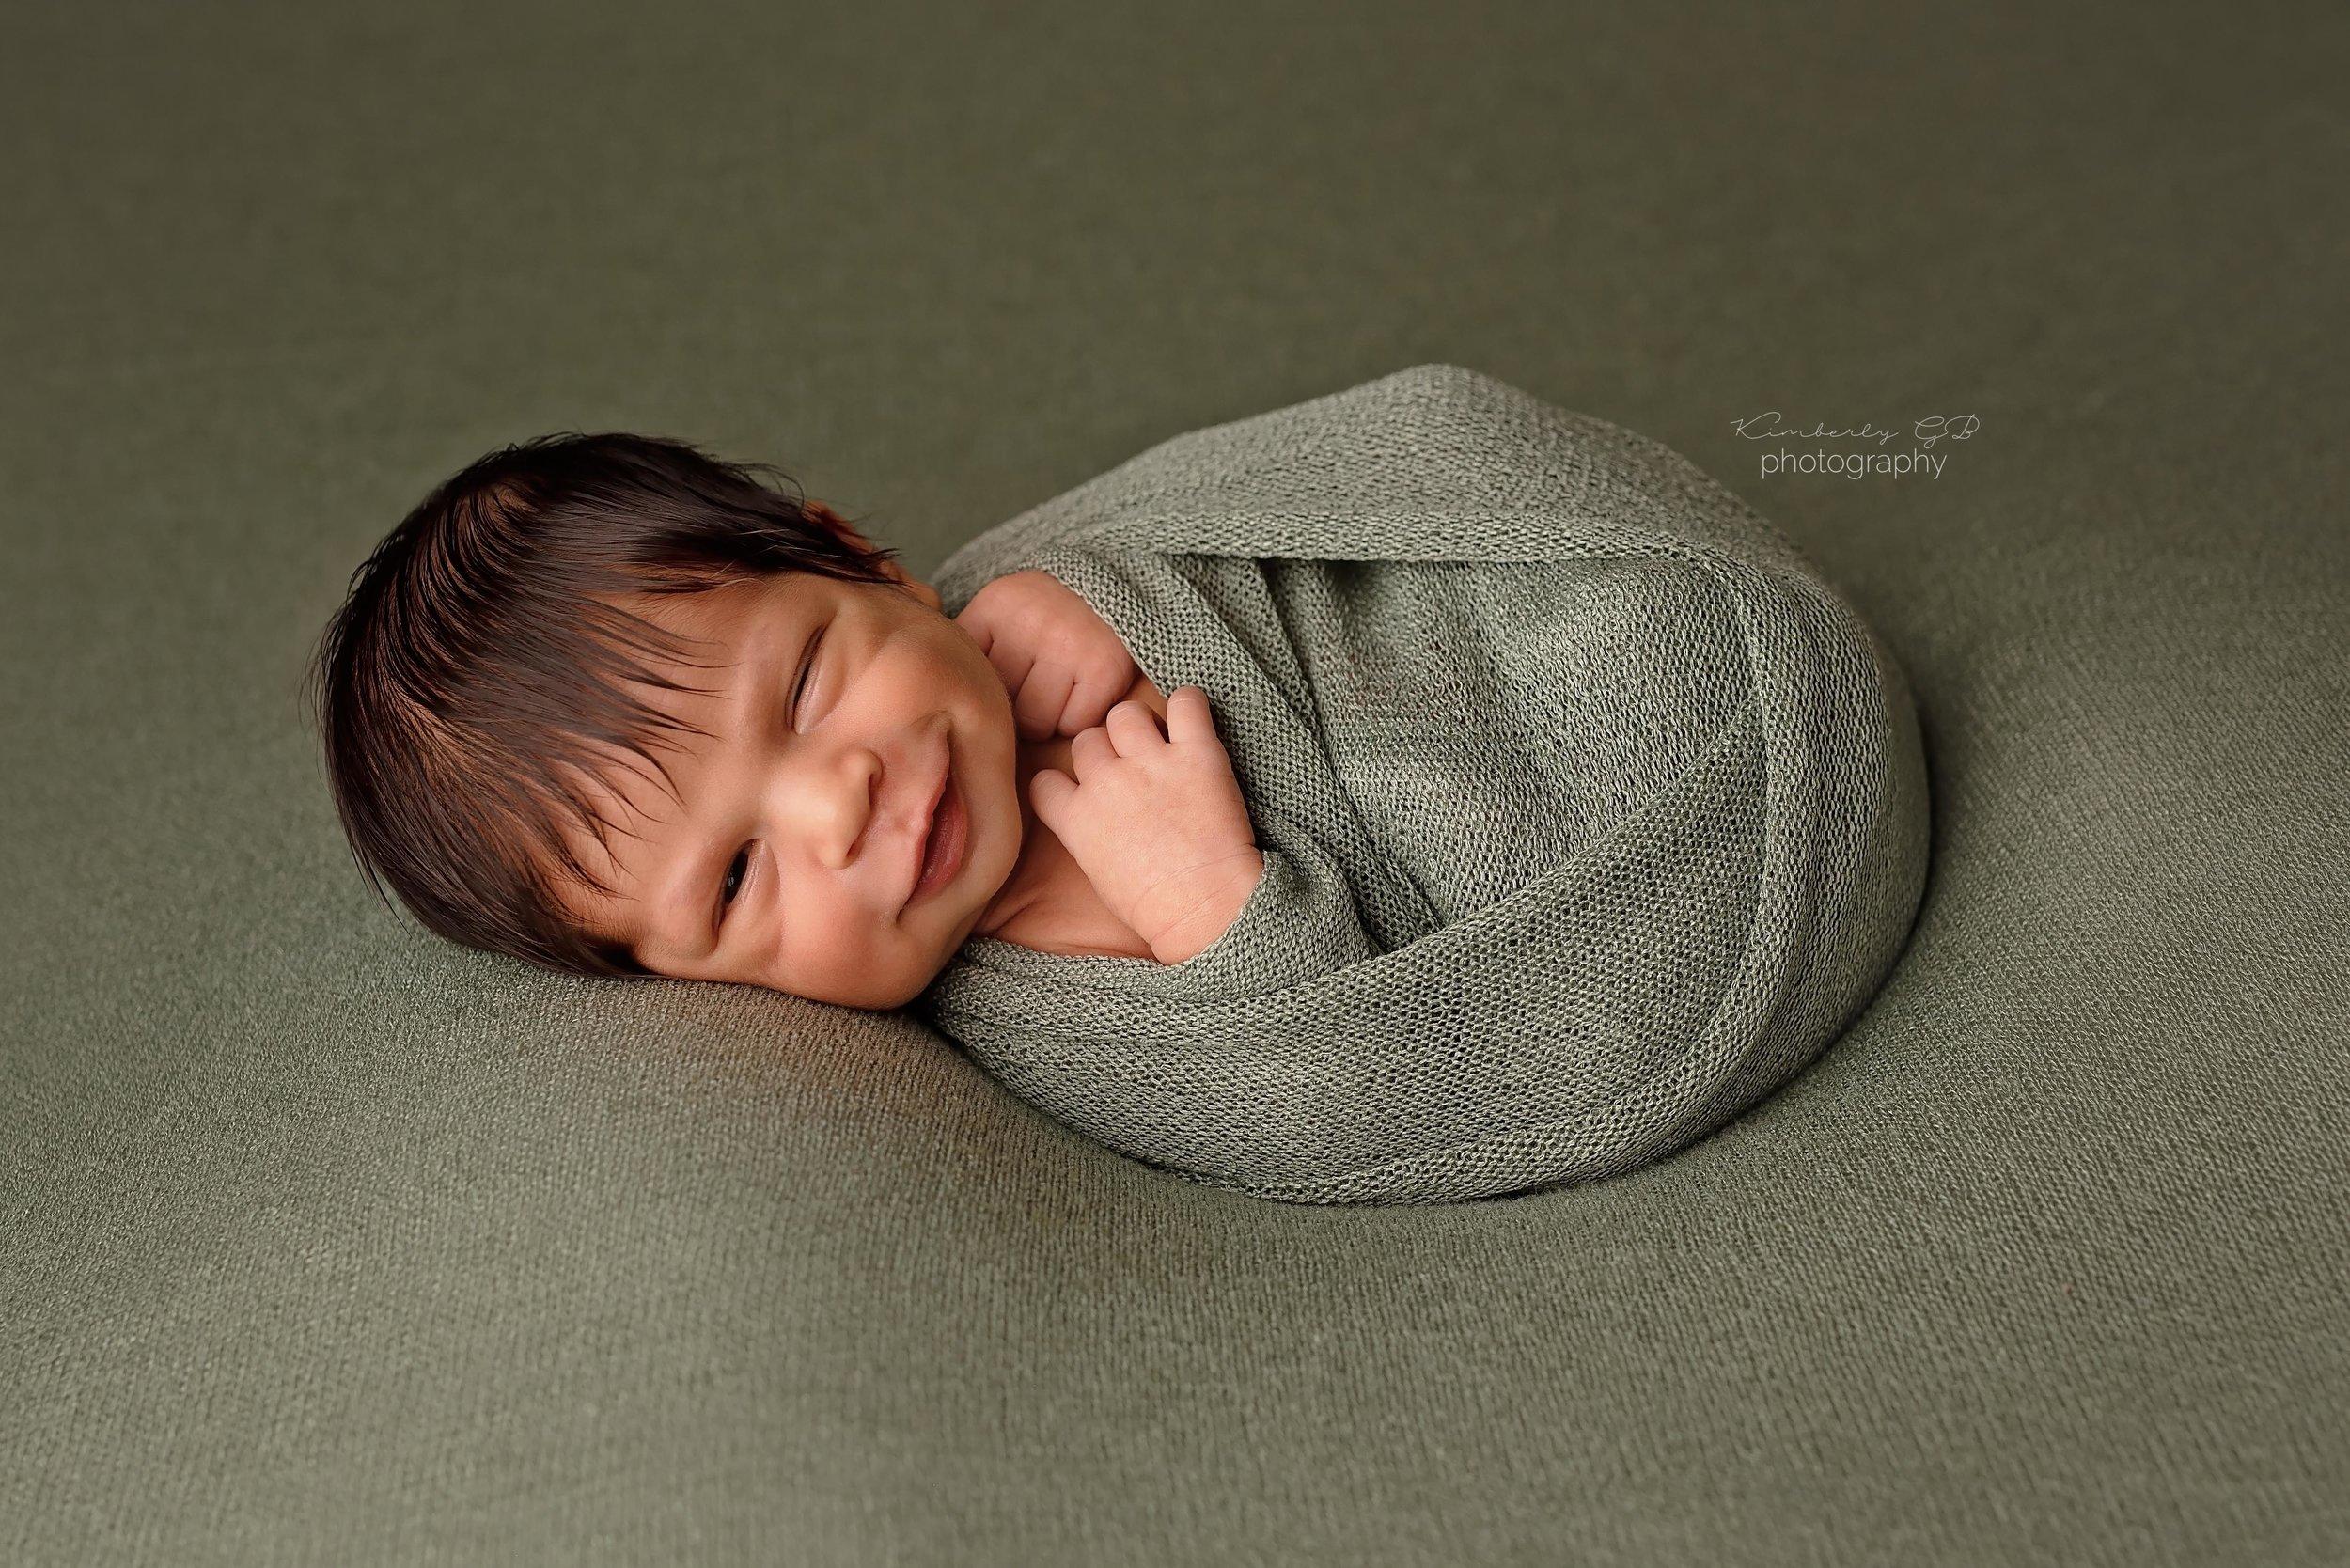 fotografia-de-recien-nacidos-bebes-newborn-en-puerto-rico-kimberly-gb-photography-fotografa-232.jpg